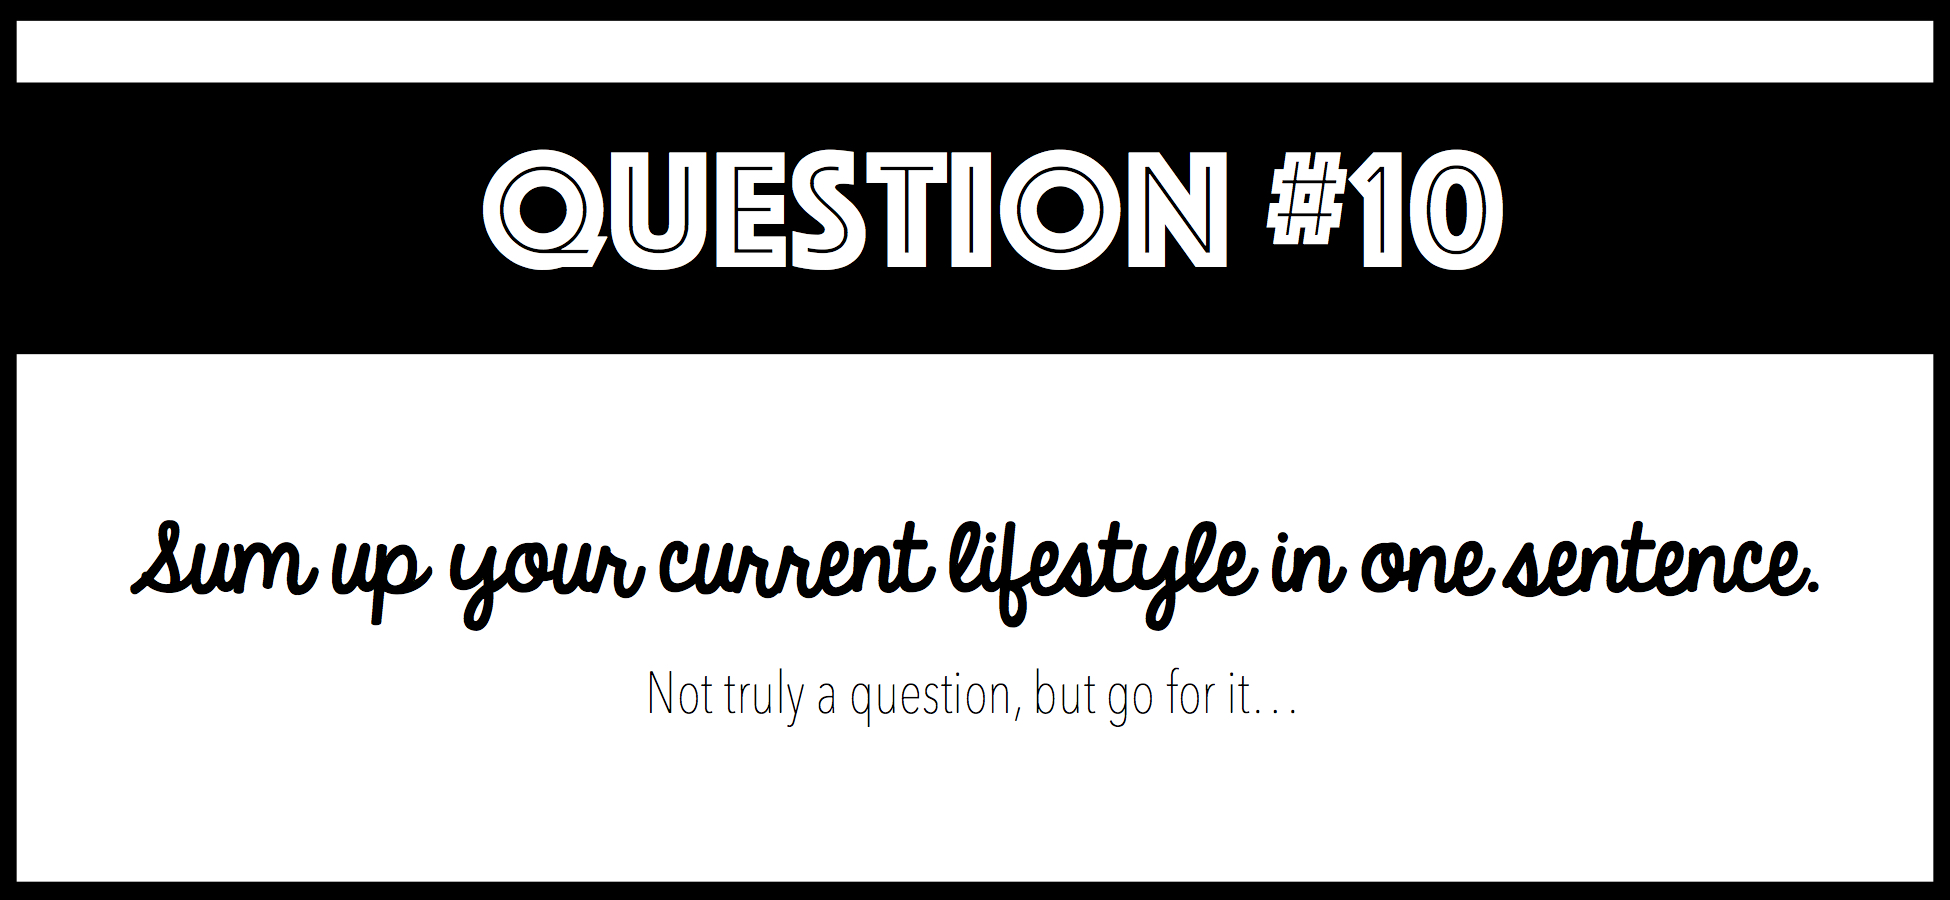 Q10 copy.jpg